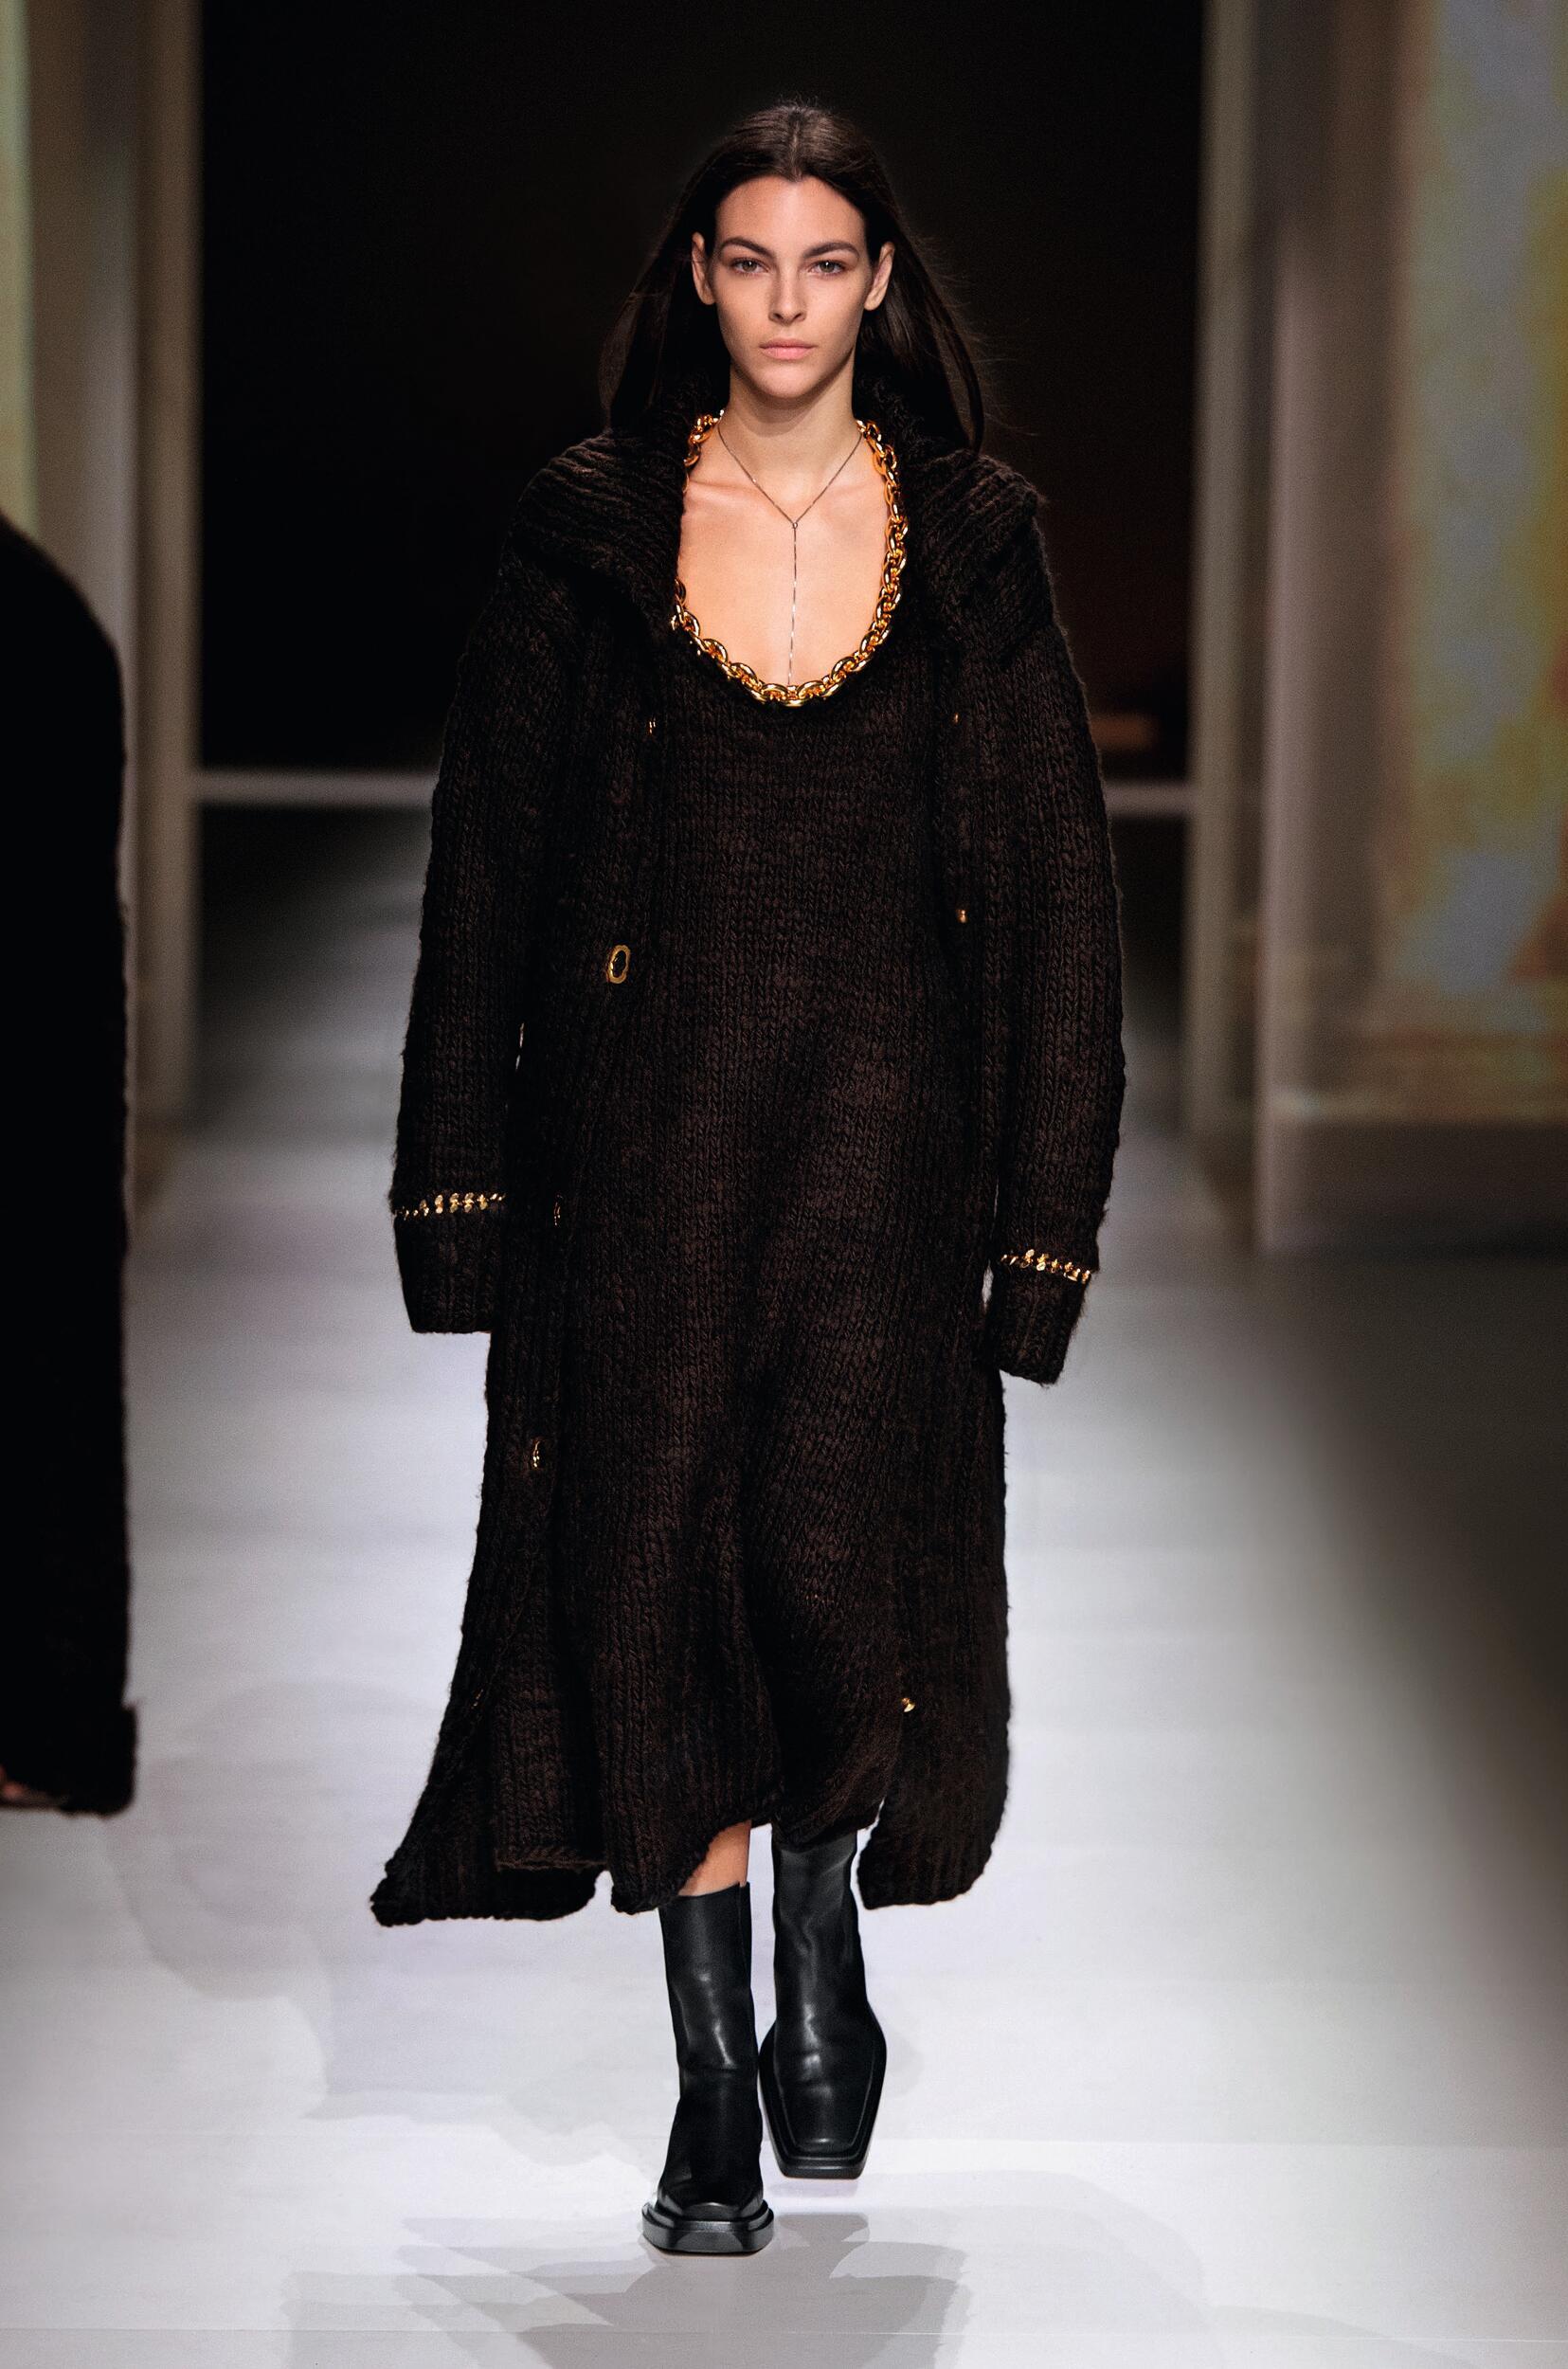 Bottega Veneta Womenswear Collection Trends